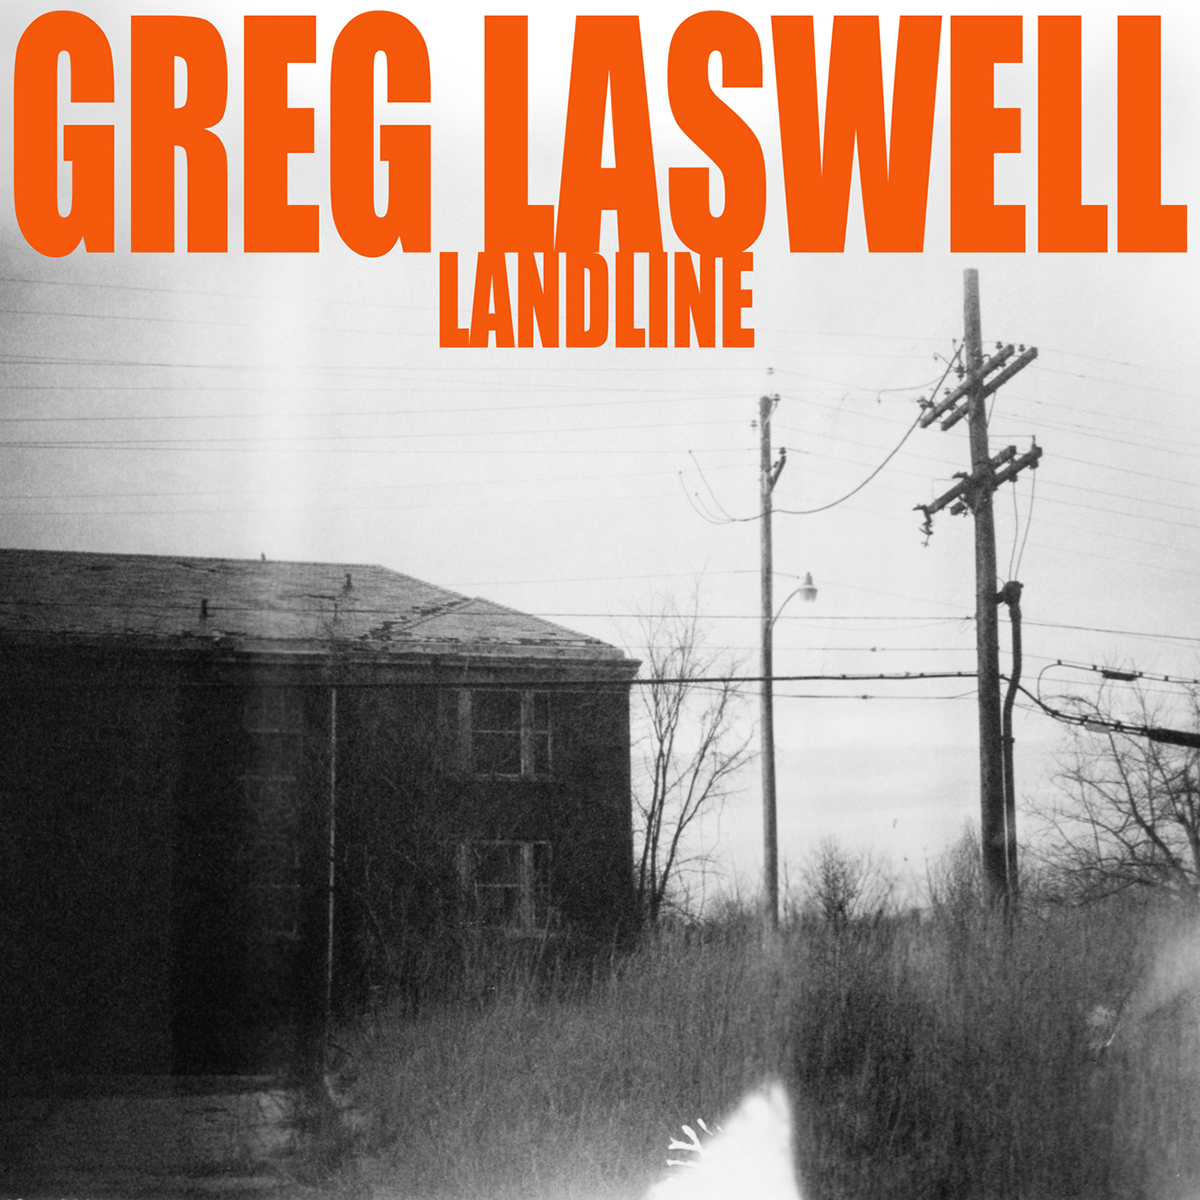 Greg Laswell - Landline MP3 Download